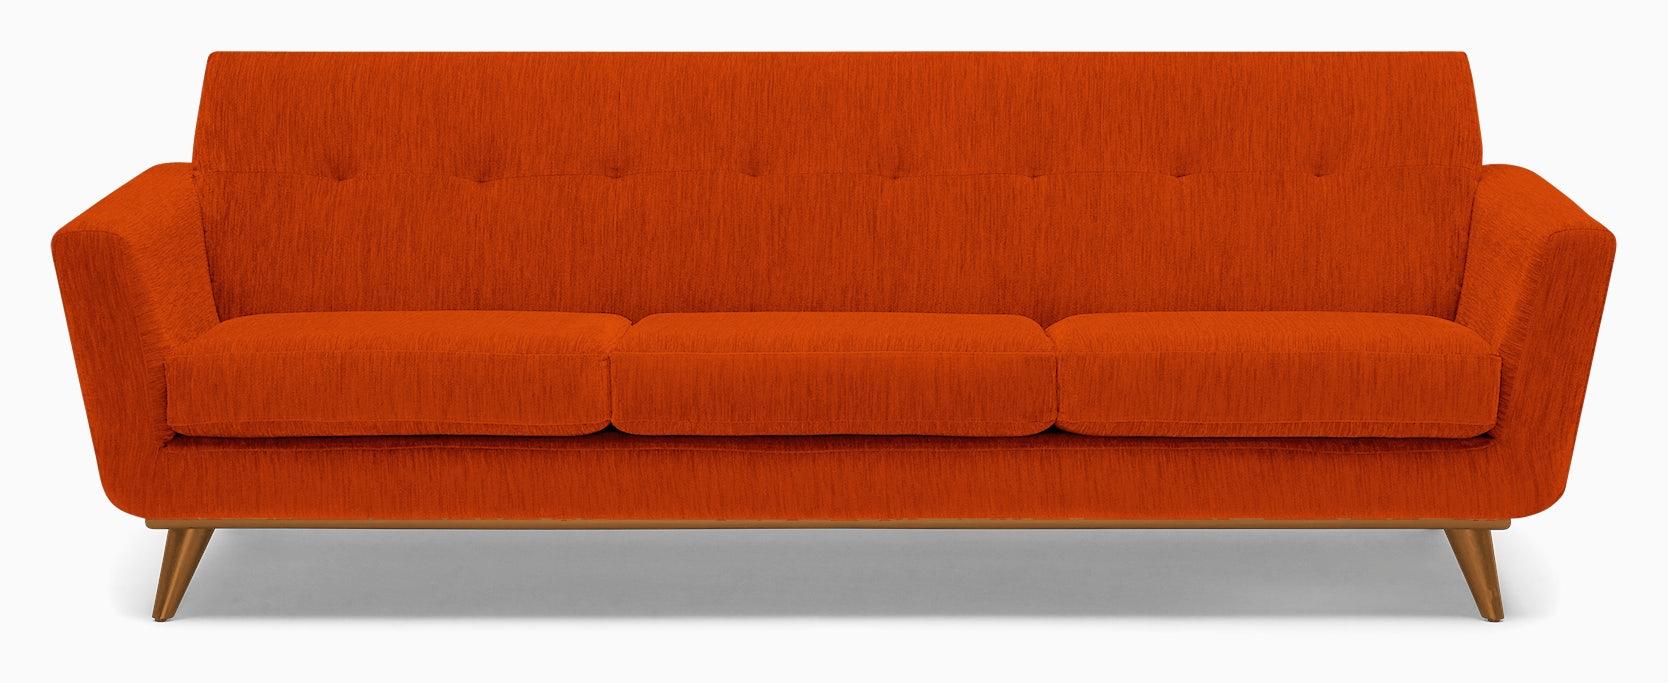 hughes grand sofa vibe sunkist